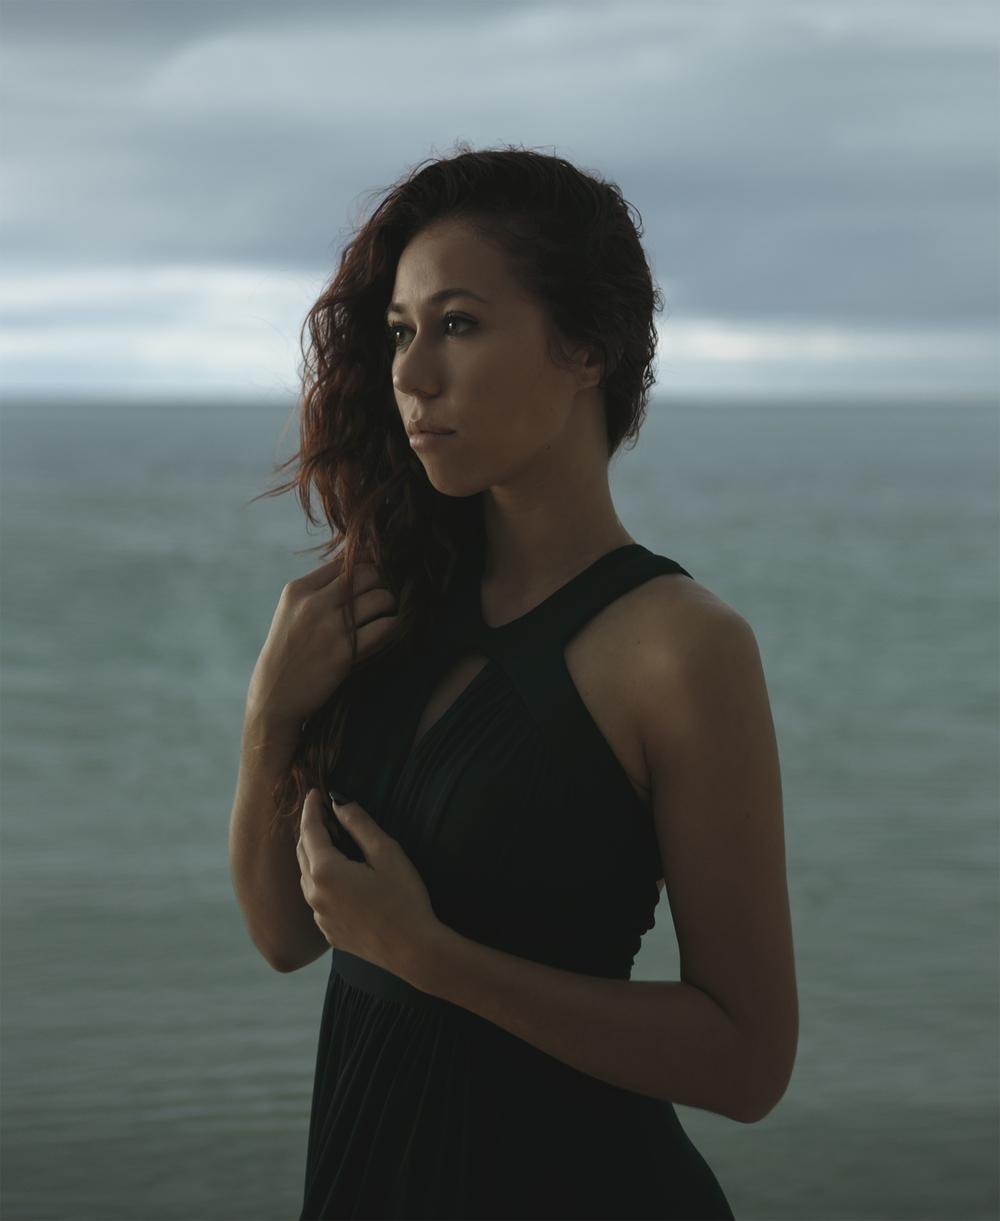 Paige Marie Bossart (Photographer)